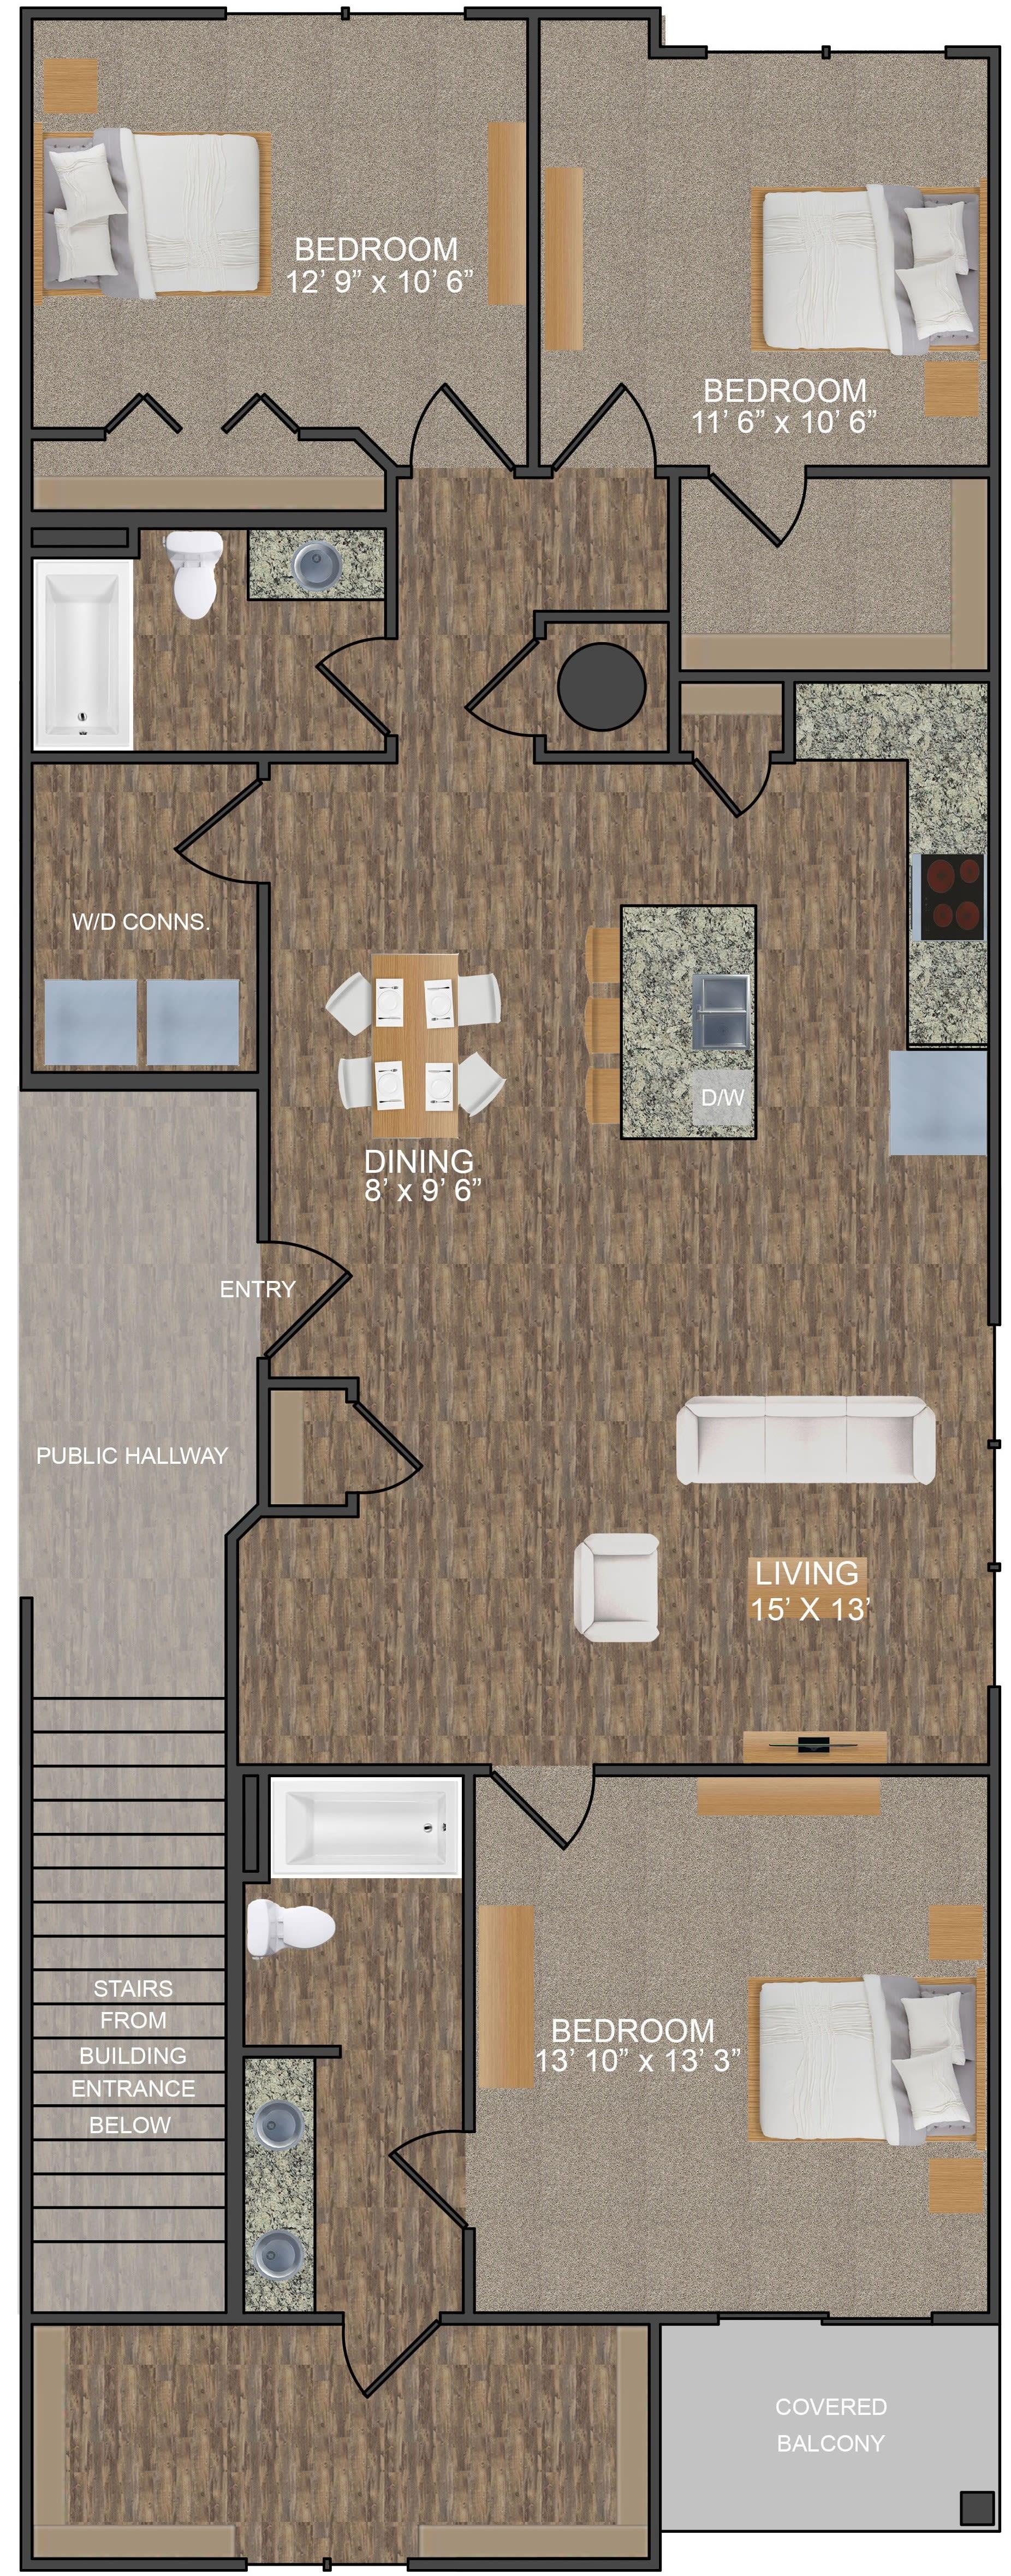 Apartments for Rent in Hixson Chattanooga, TN | Oakwood Estates